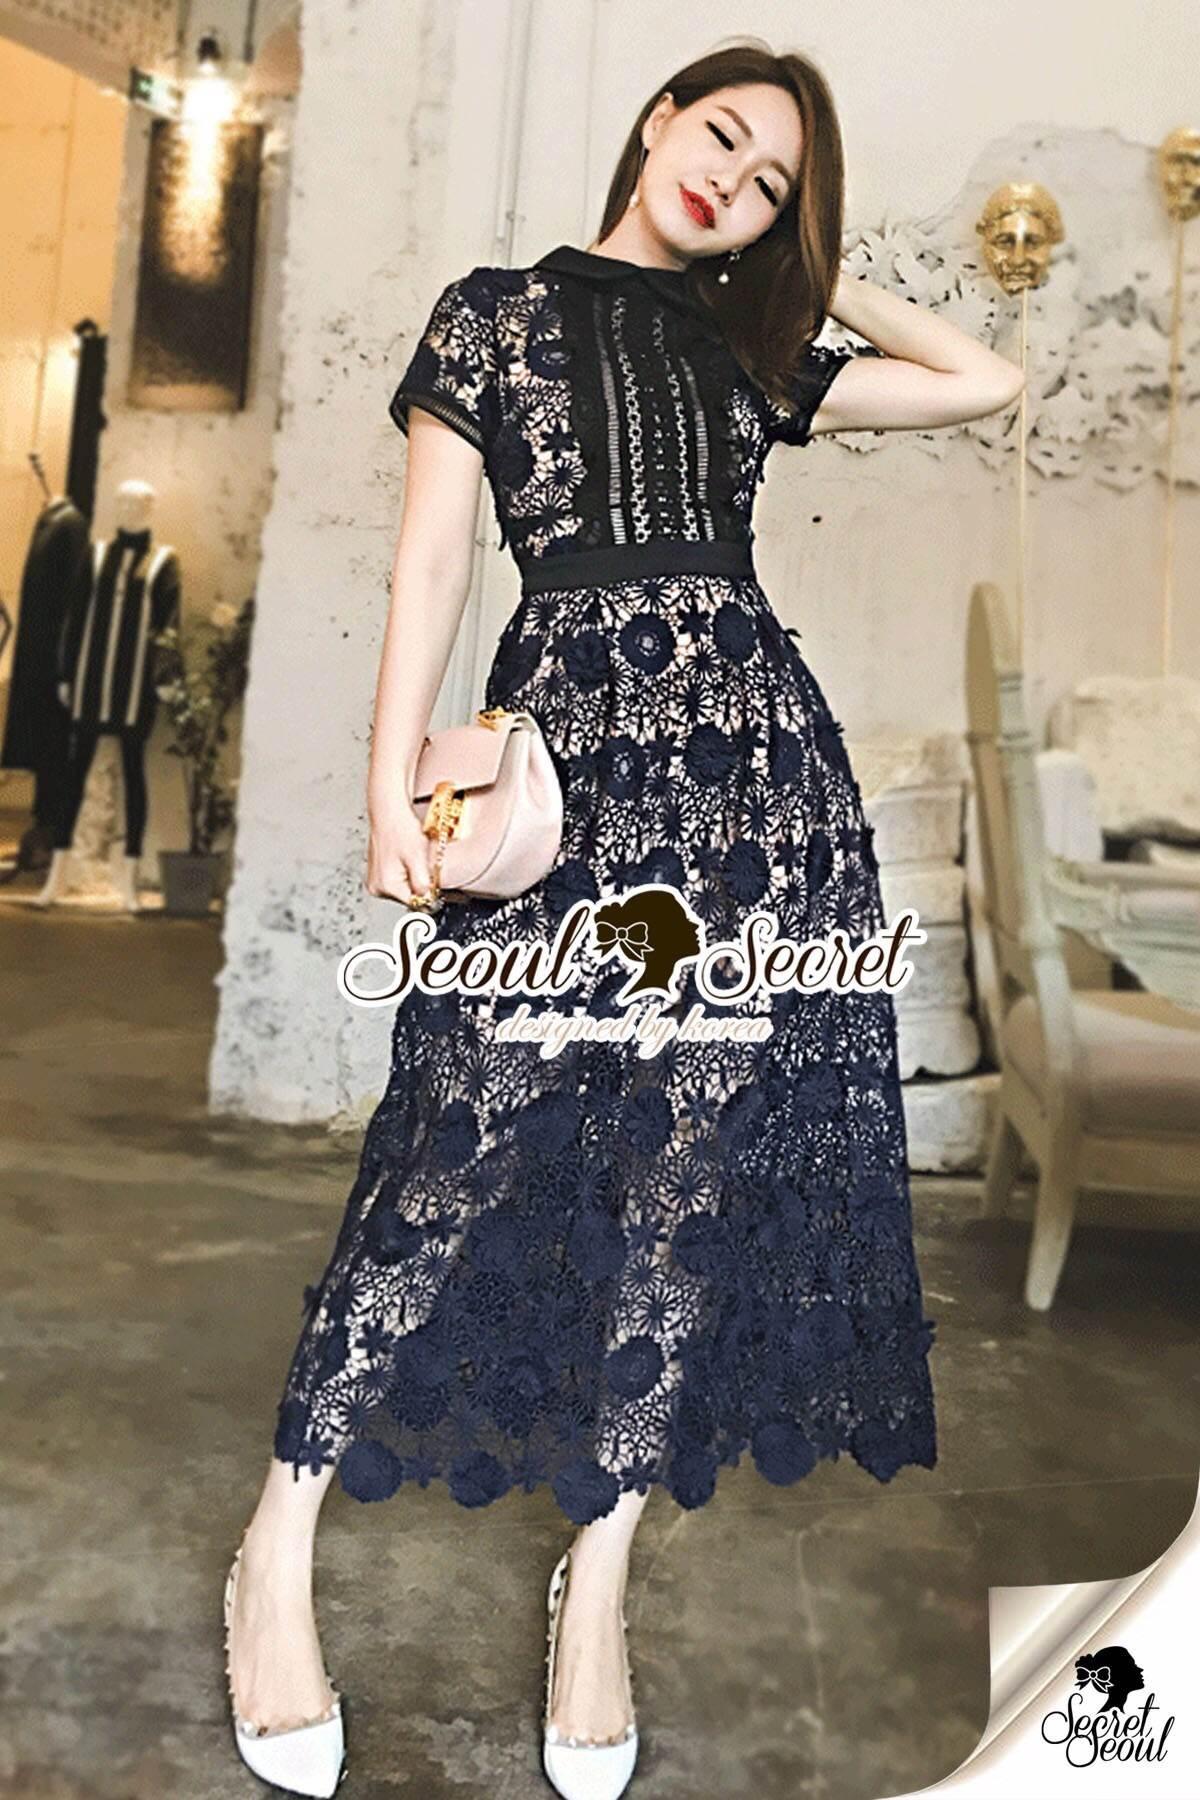 Seoul Secret Say's... Poppy Navy Lace Curve Out MaxiDress